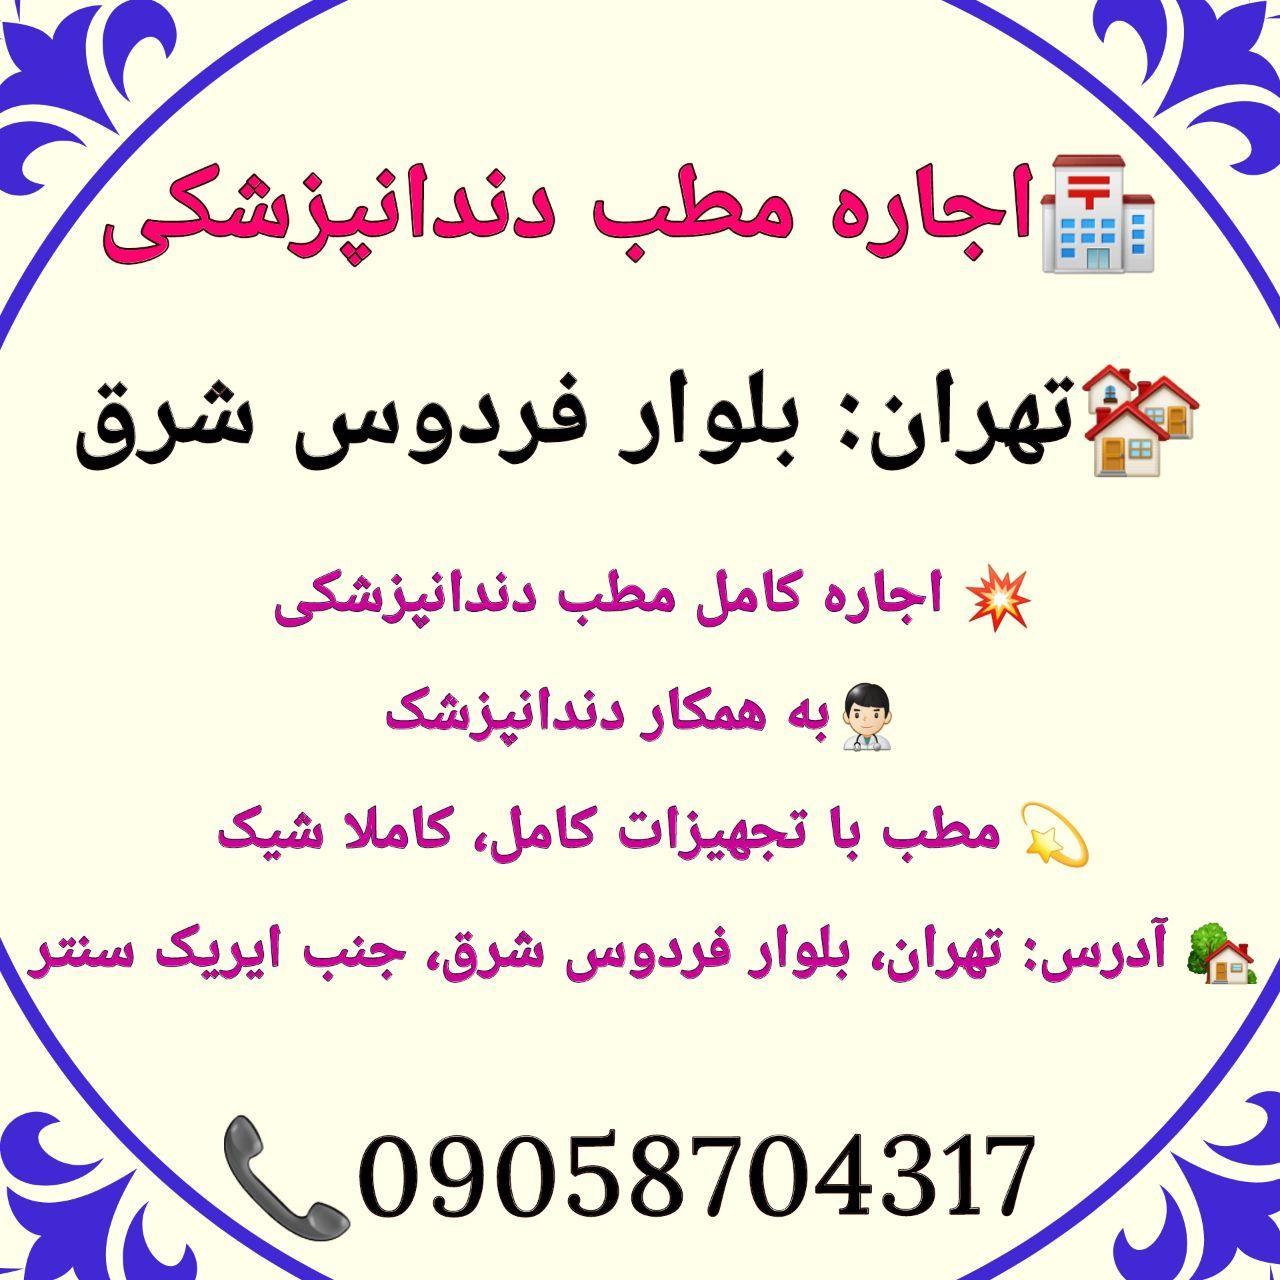 تهران: بلوار فردوس شرق، اجاره مطب دندانپزشکی